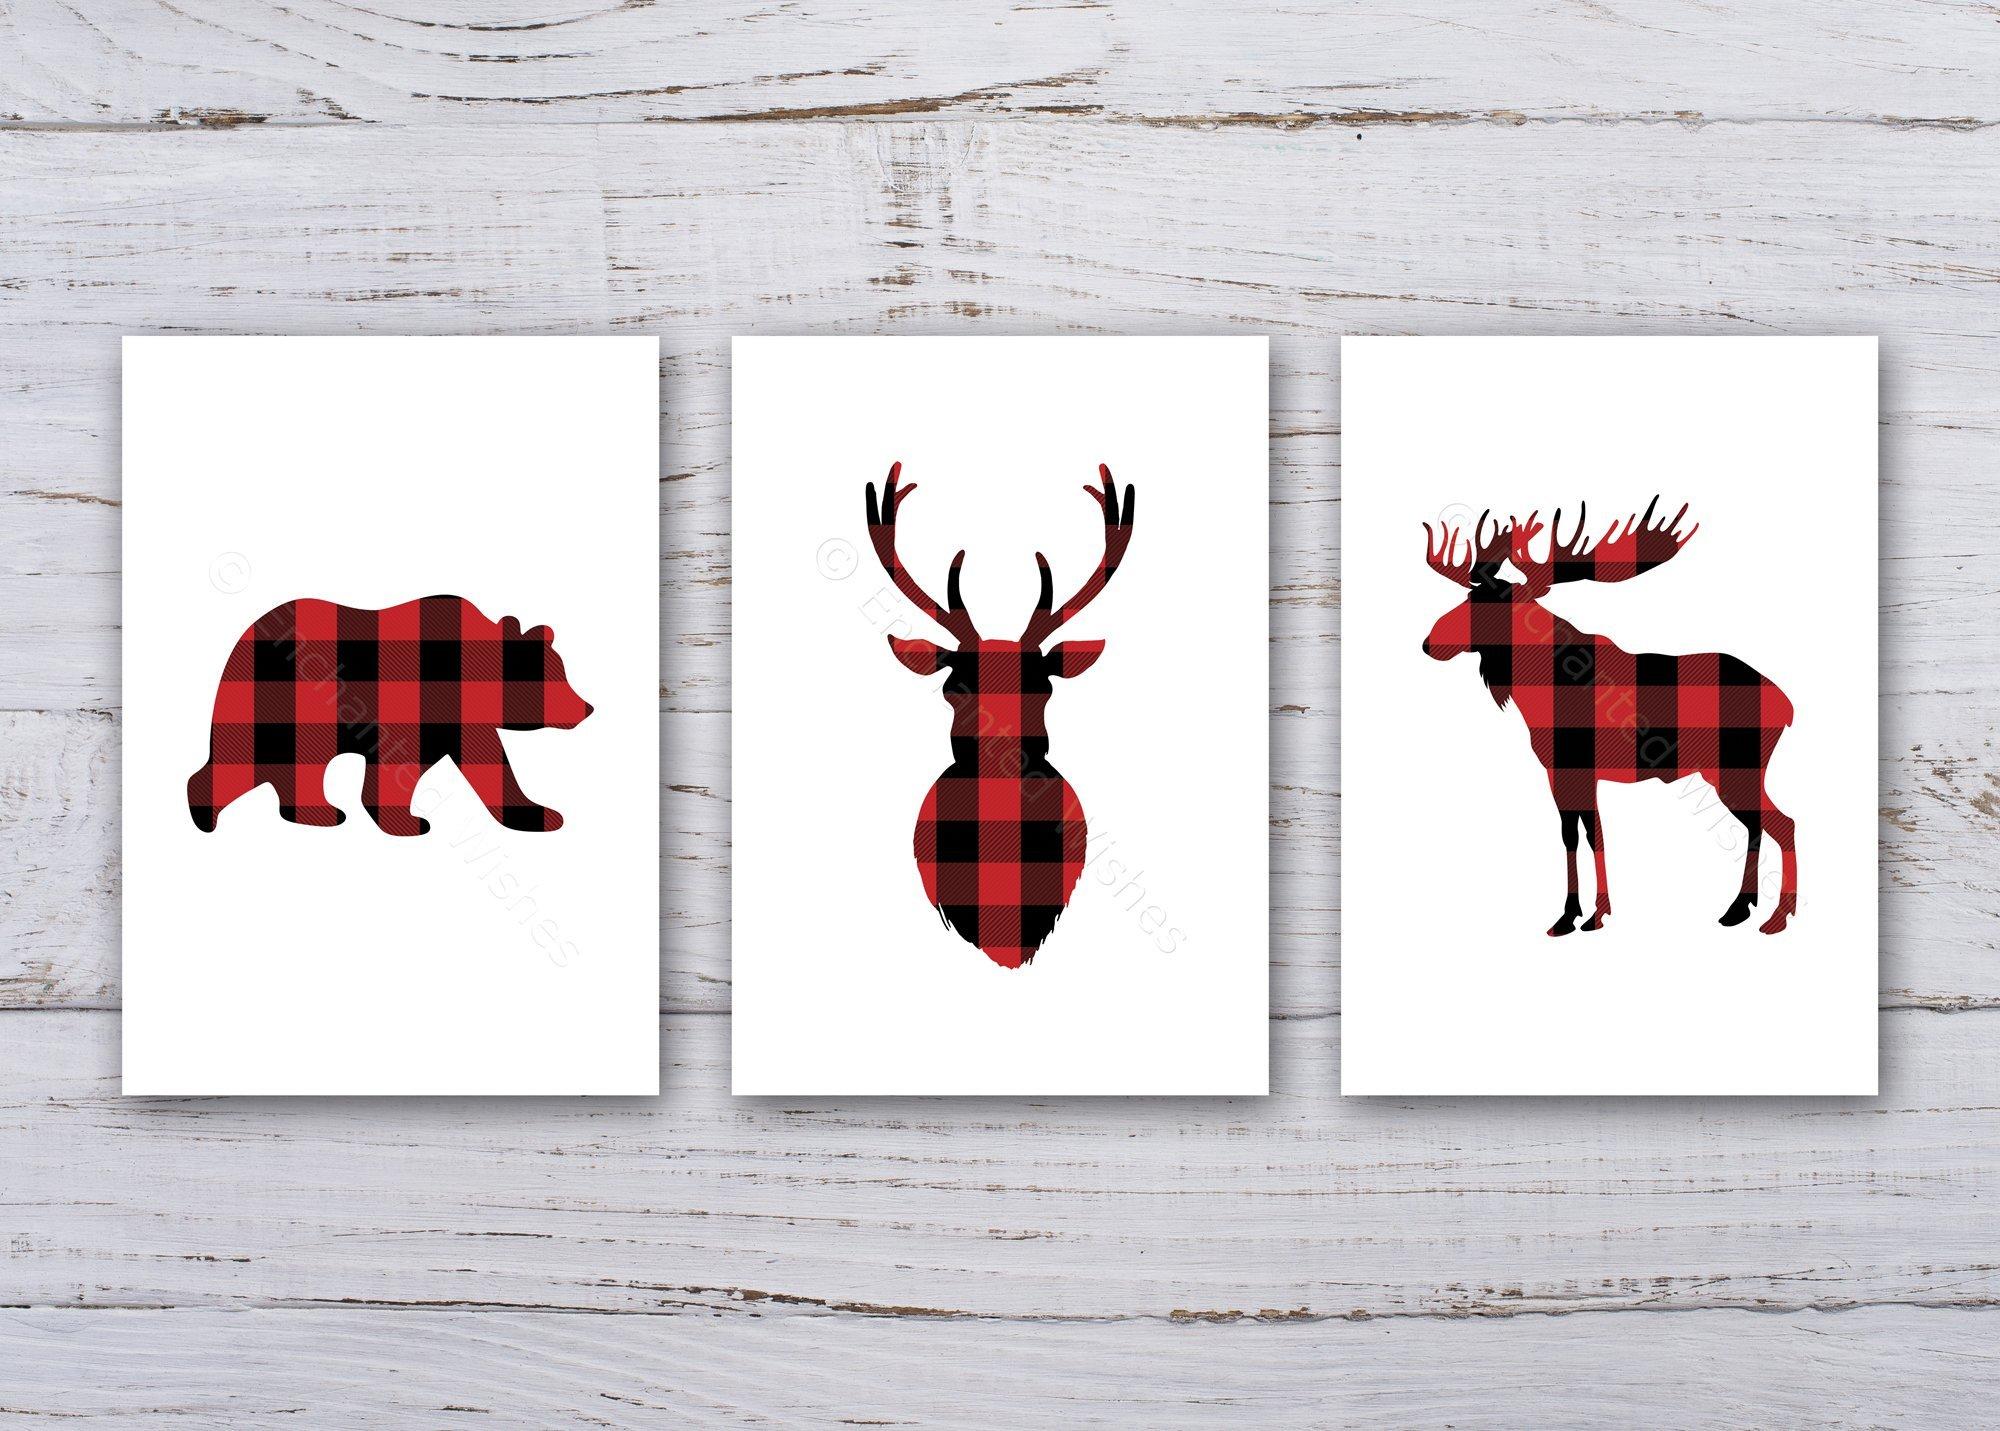 Plaid Tartan Wild Woodland Animals Set Of 3 Prints Art Prints Nursery Wall Art Quote Prints Enchanted Wishes